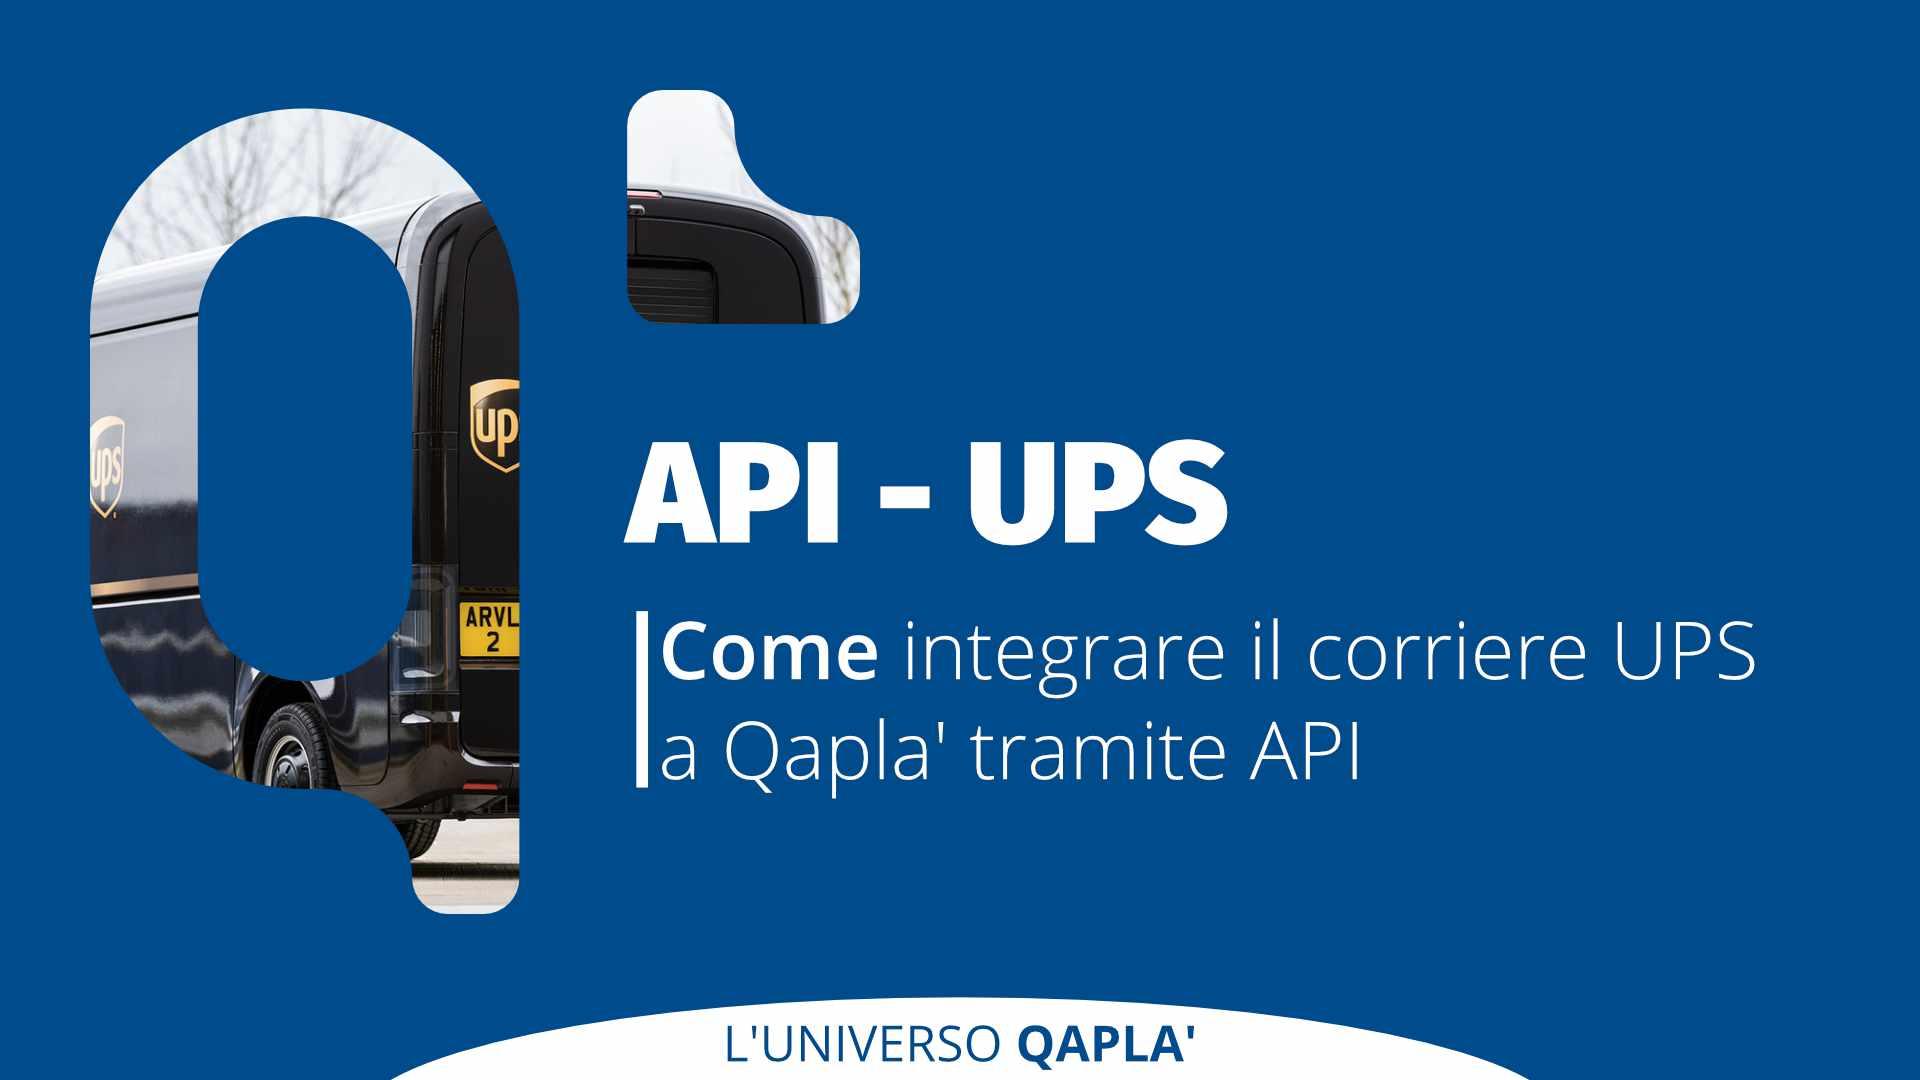 API per integrare UPS su Qapla'